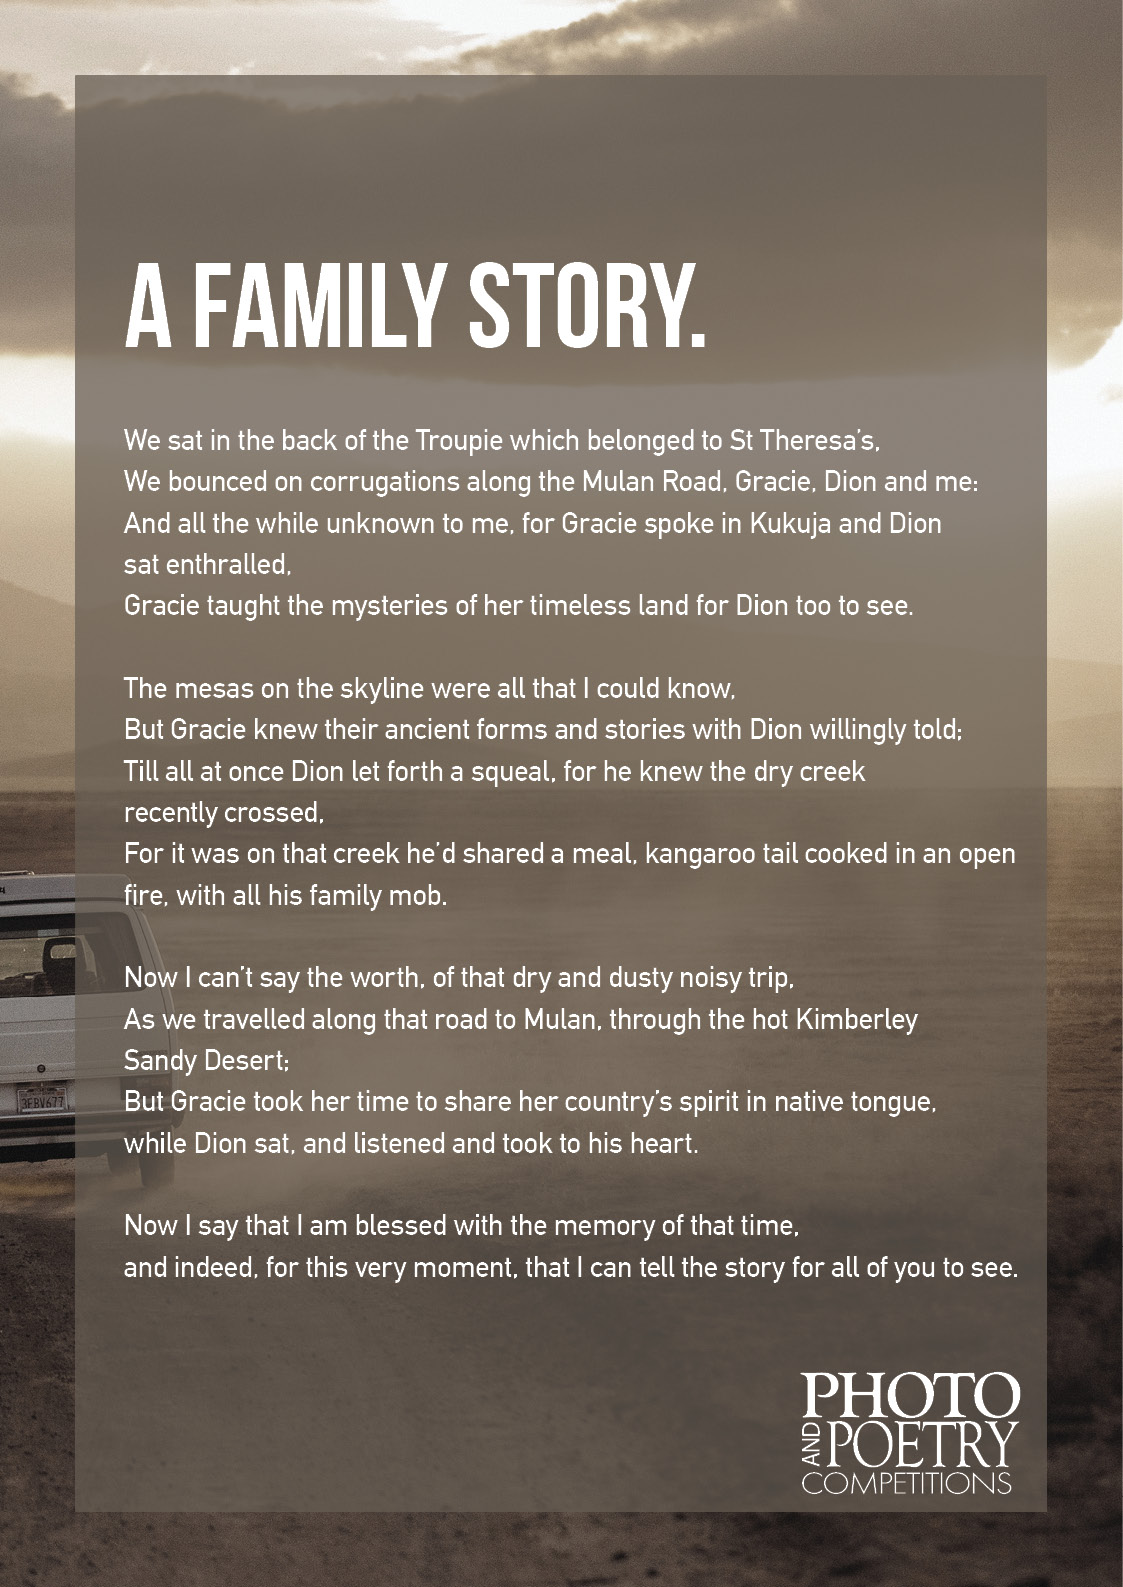 Lawrie Grant - A family story